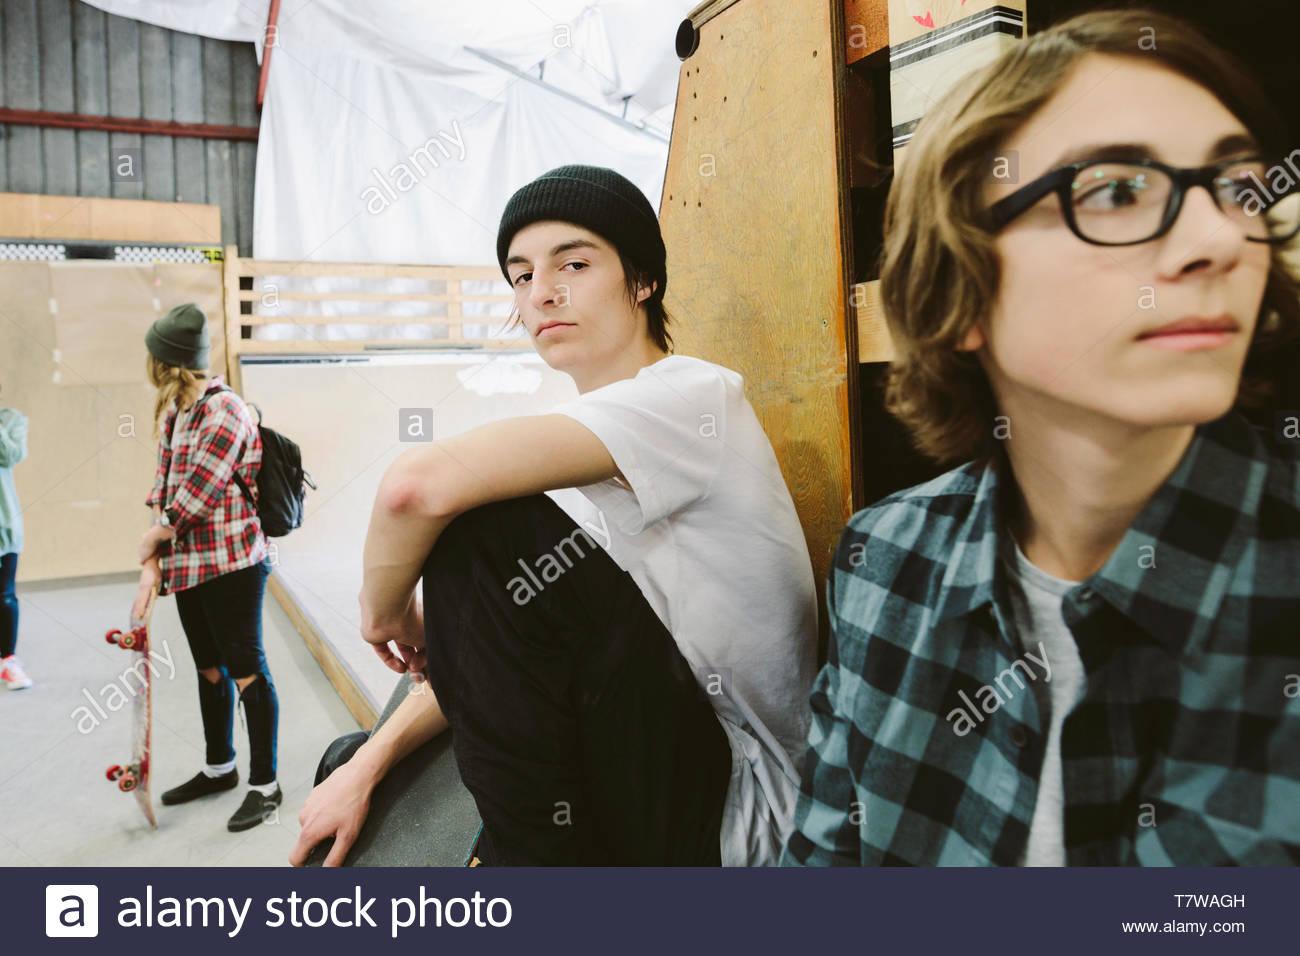 Portrait zuversichtlich, cooler Teenager an indoor Skatepark Stockbild